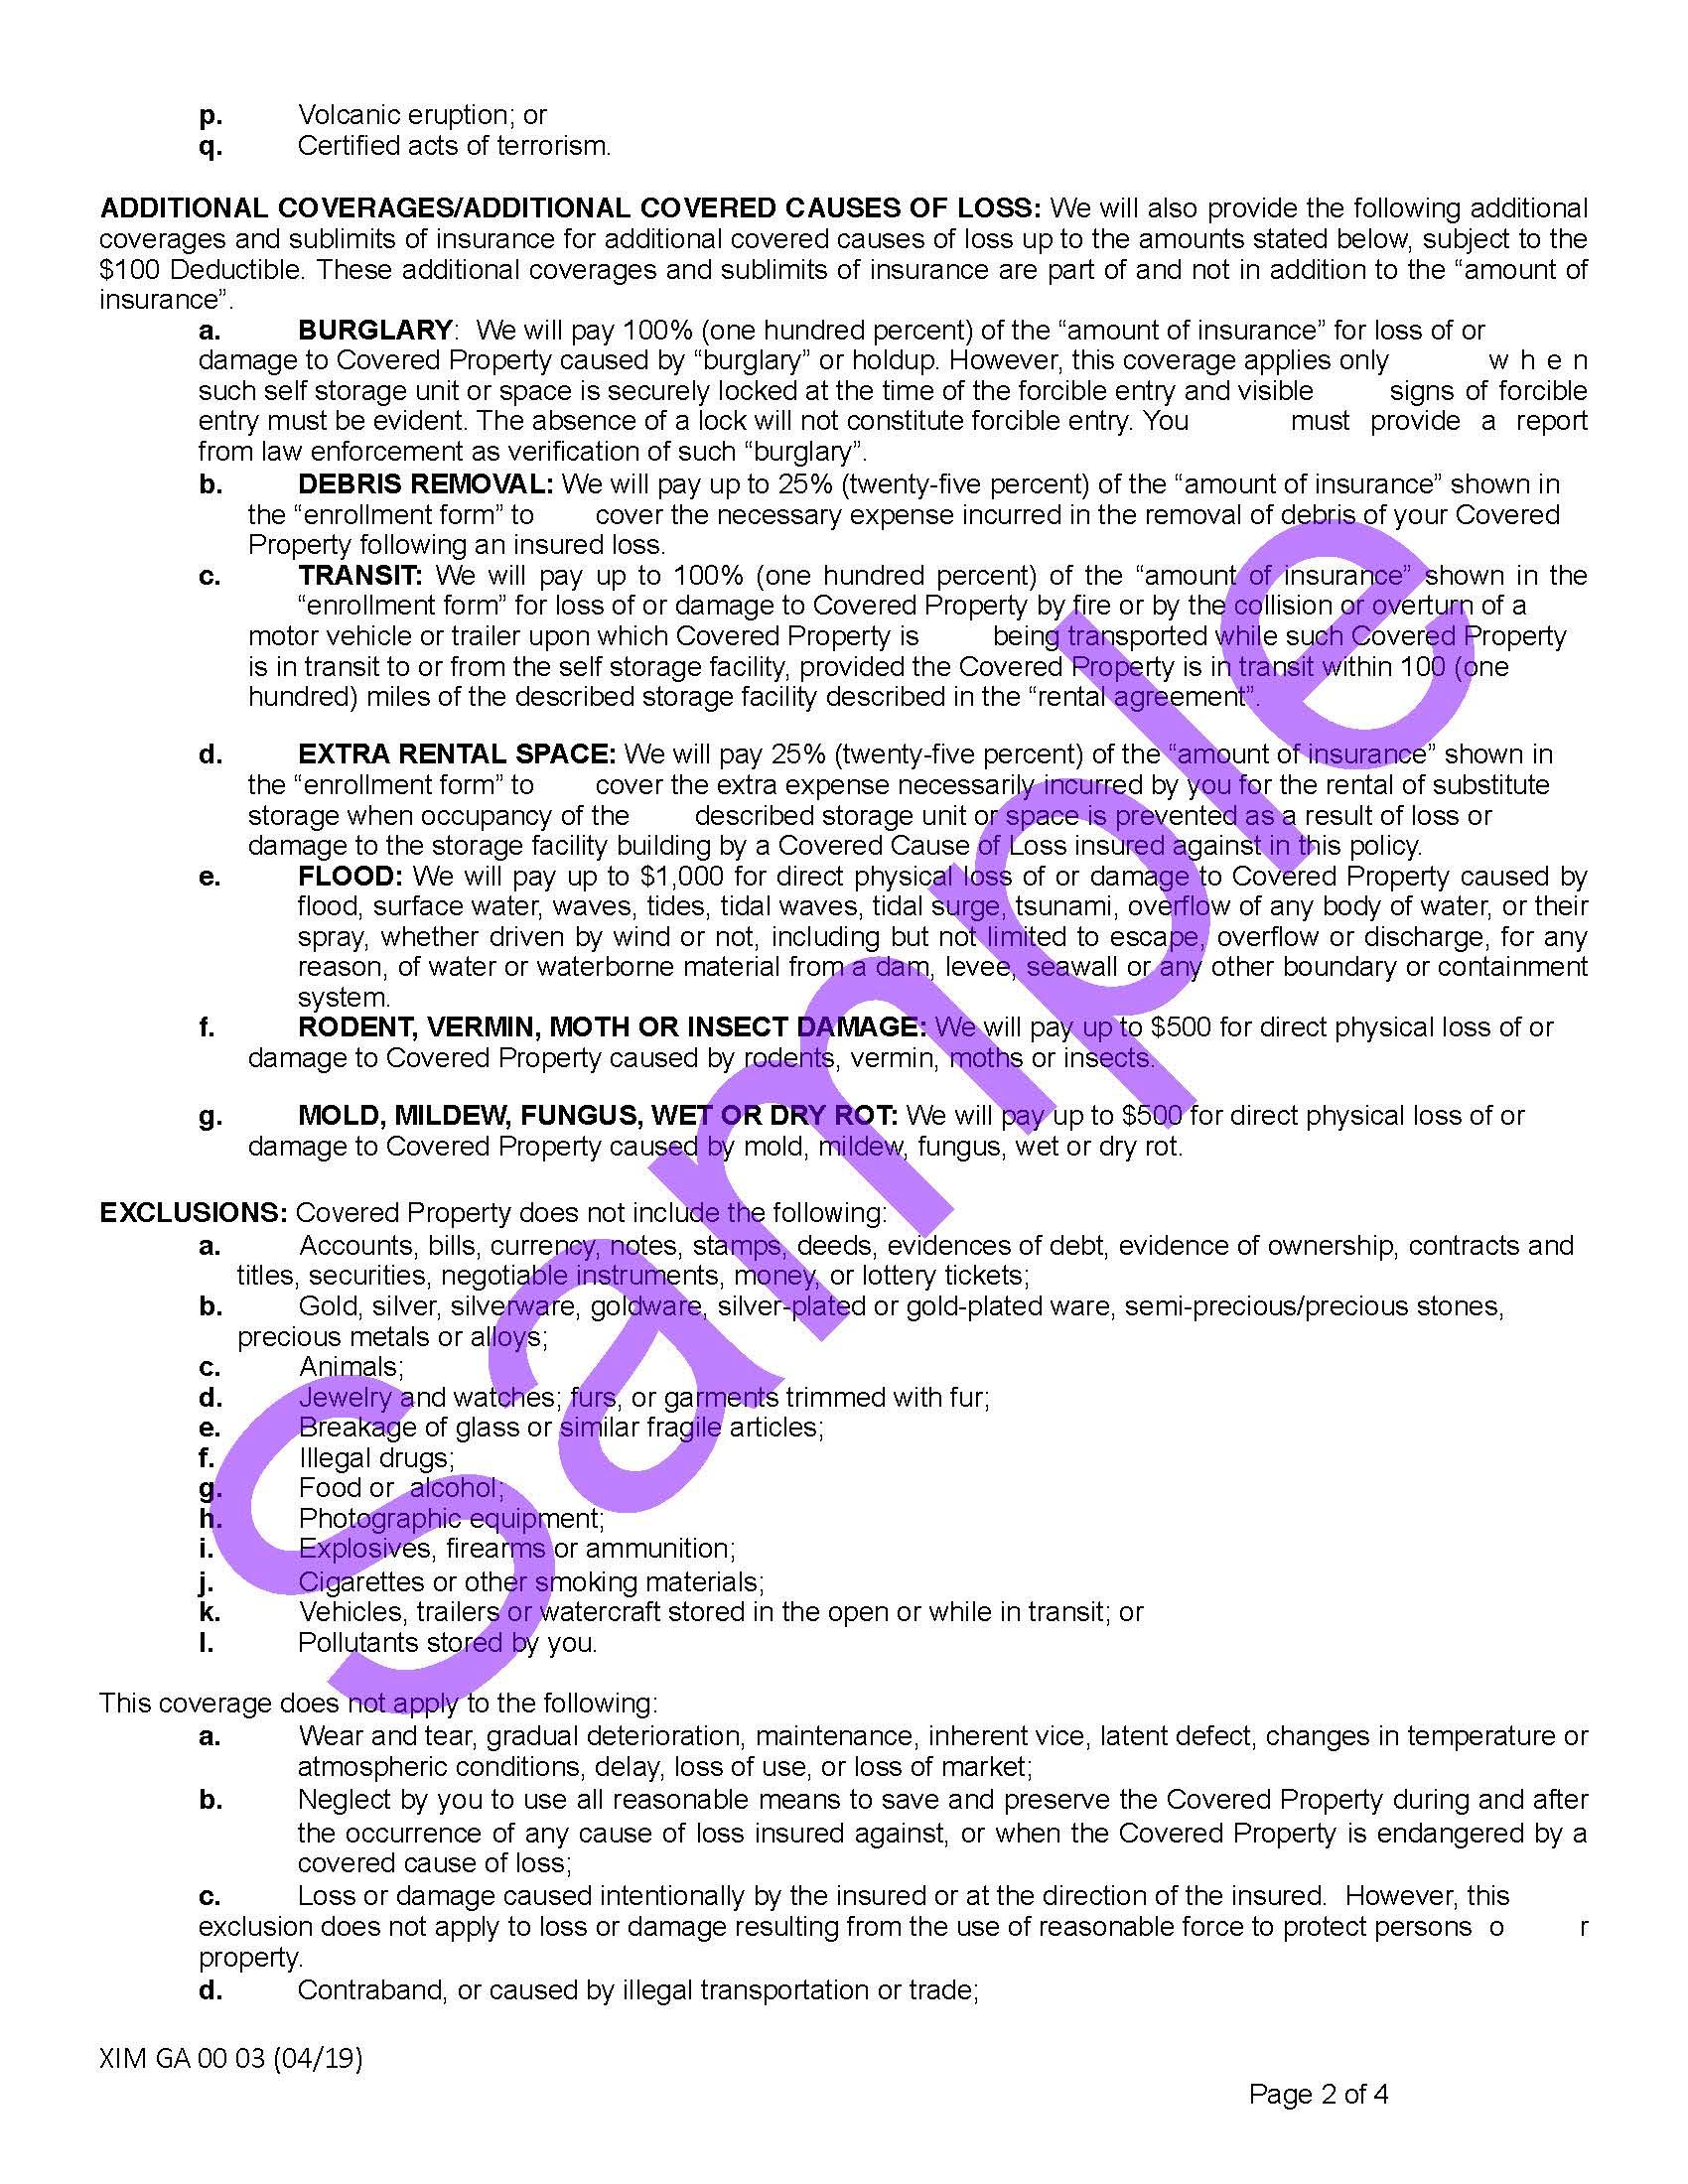 XIM GA 00 03 04 19 Georgia Certificate of Storage InsuranceSample_Page_2.jpg